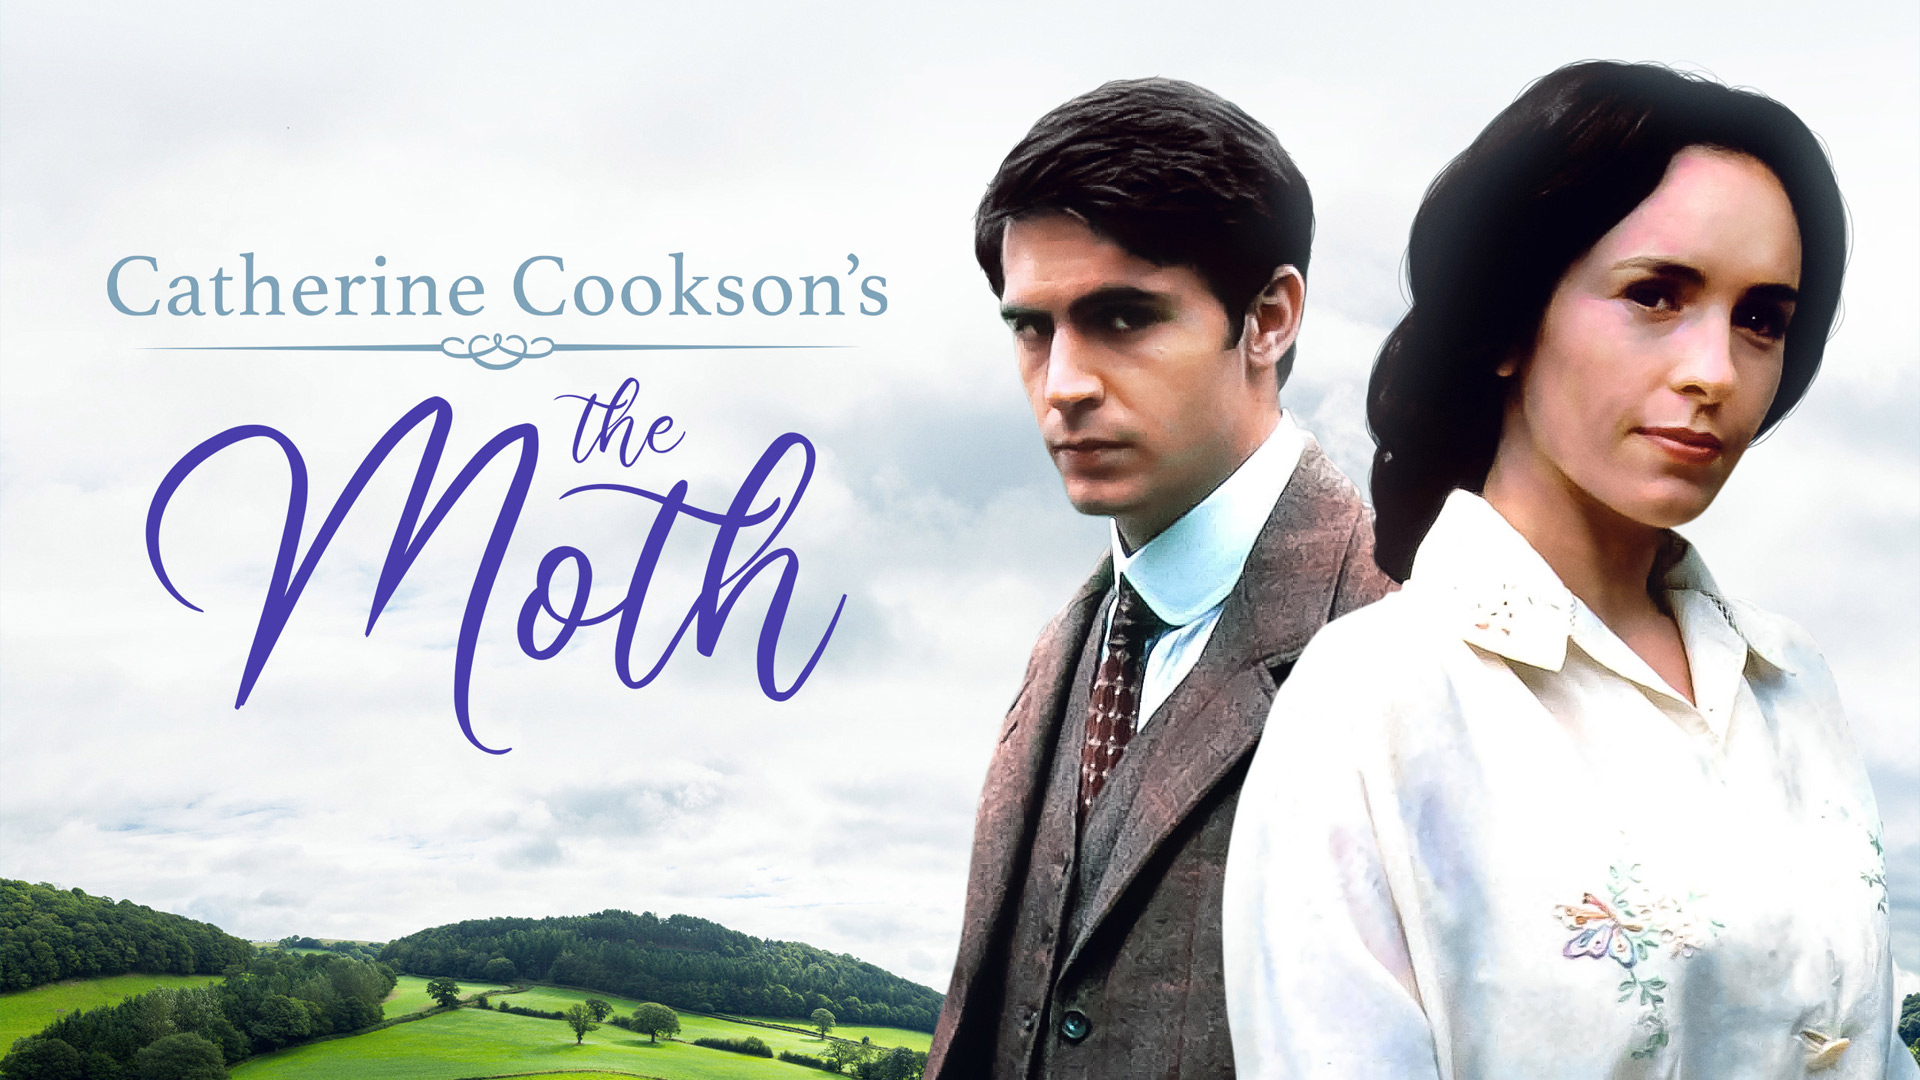 Catherine Cookson's The Moth